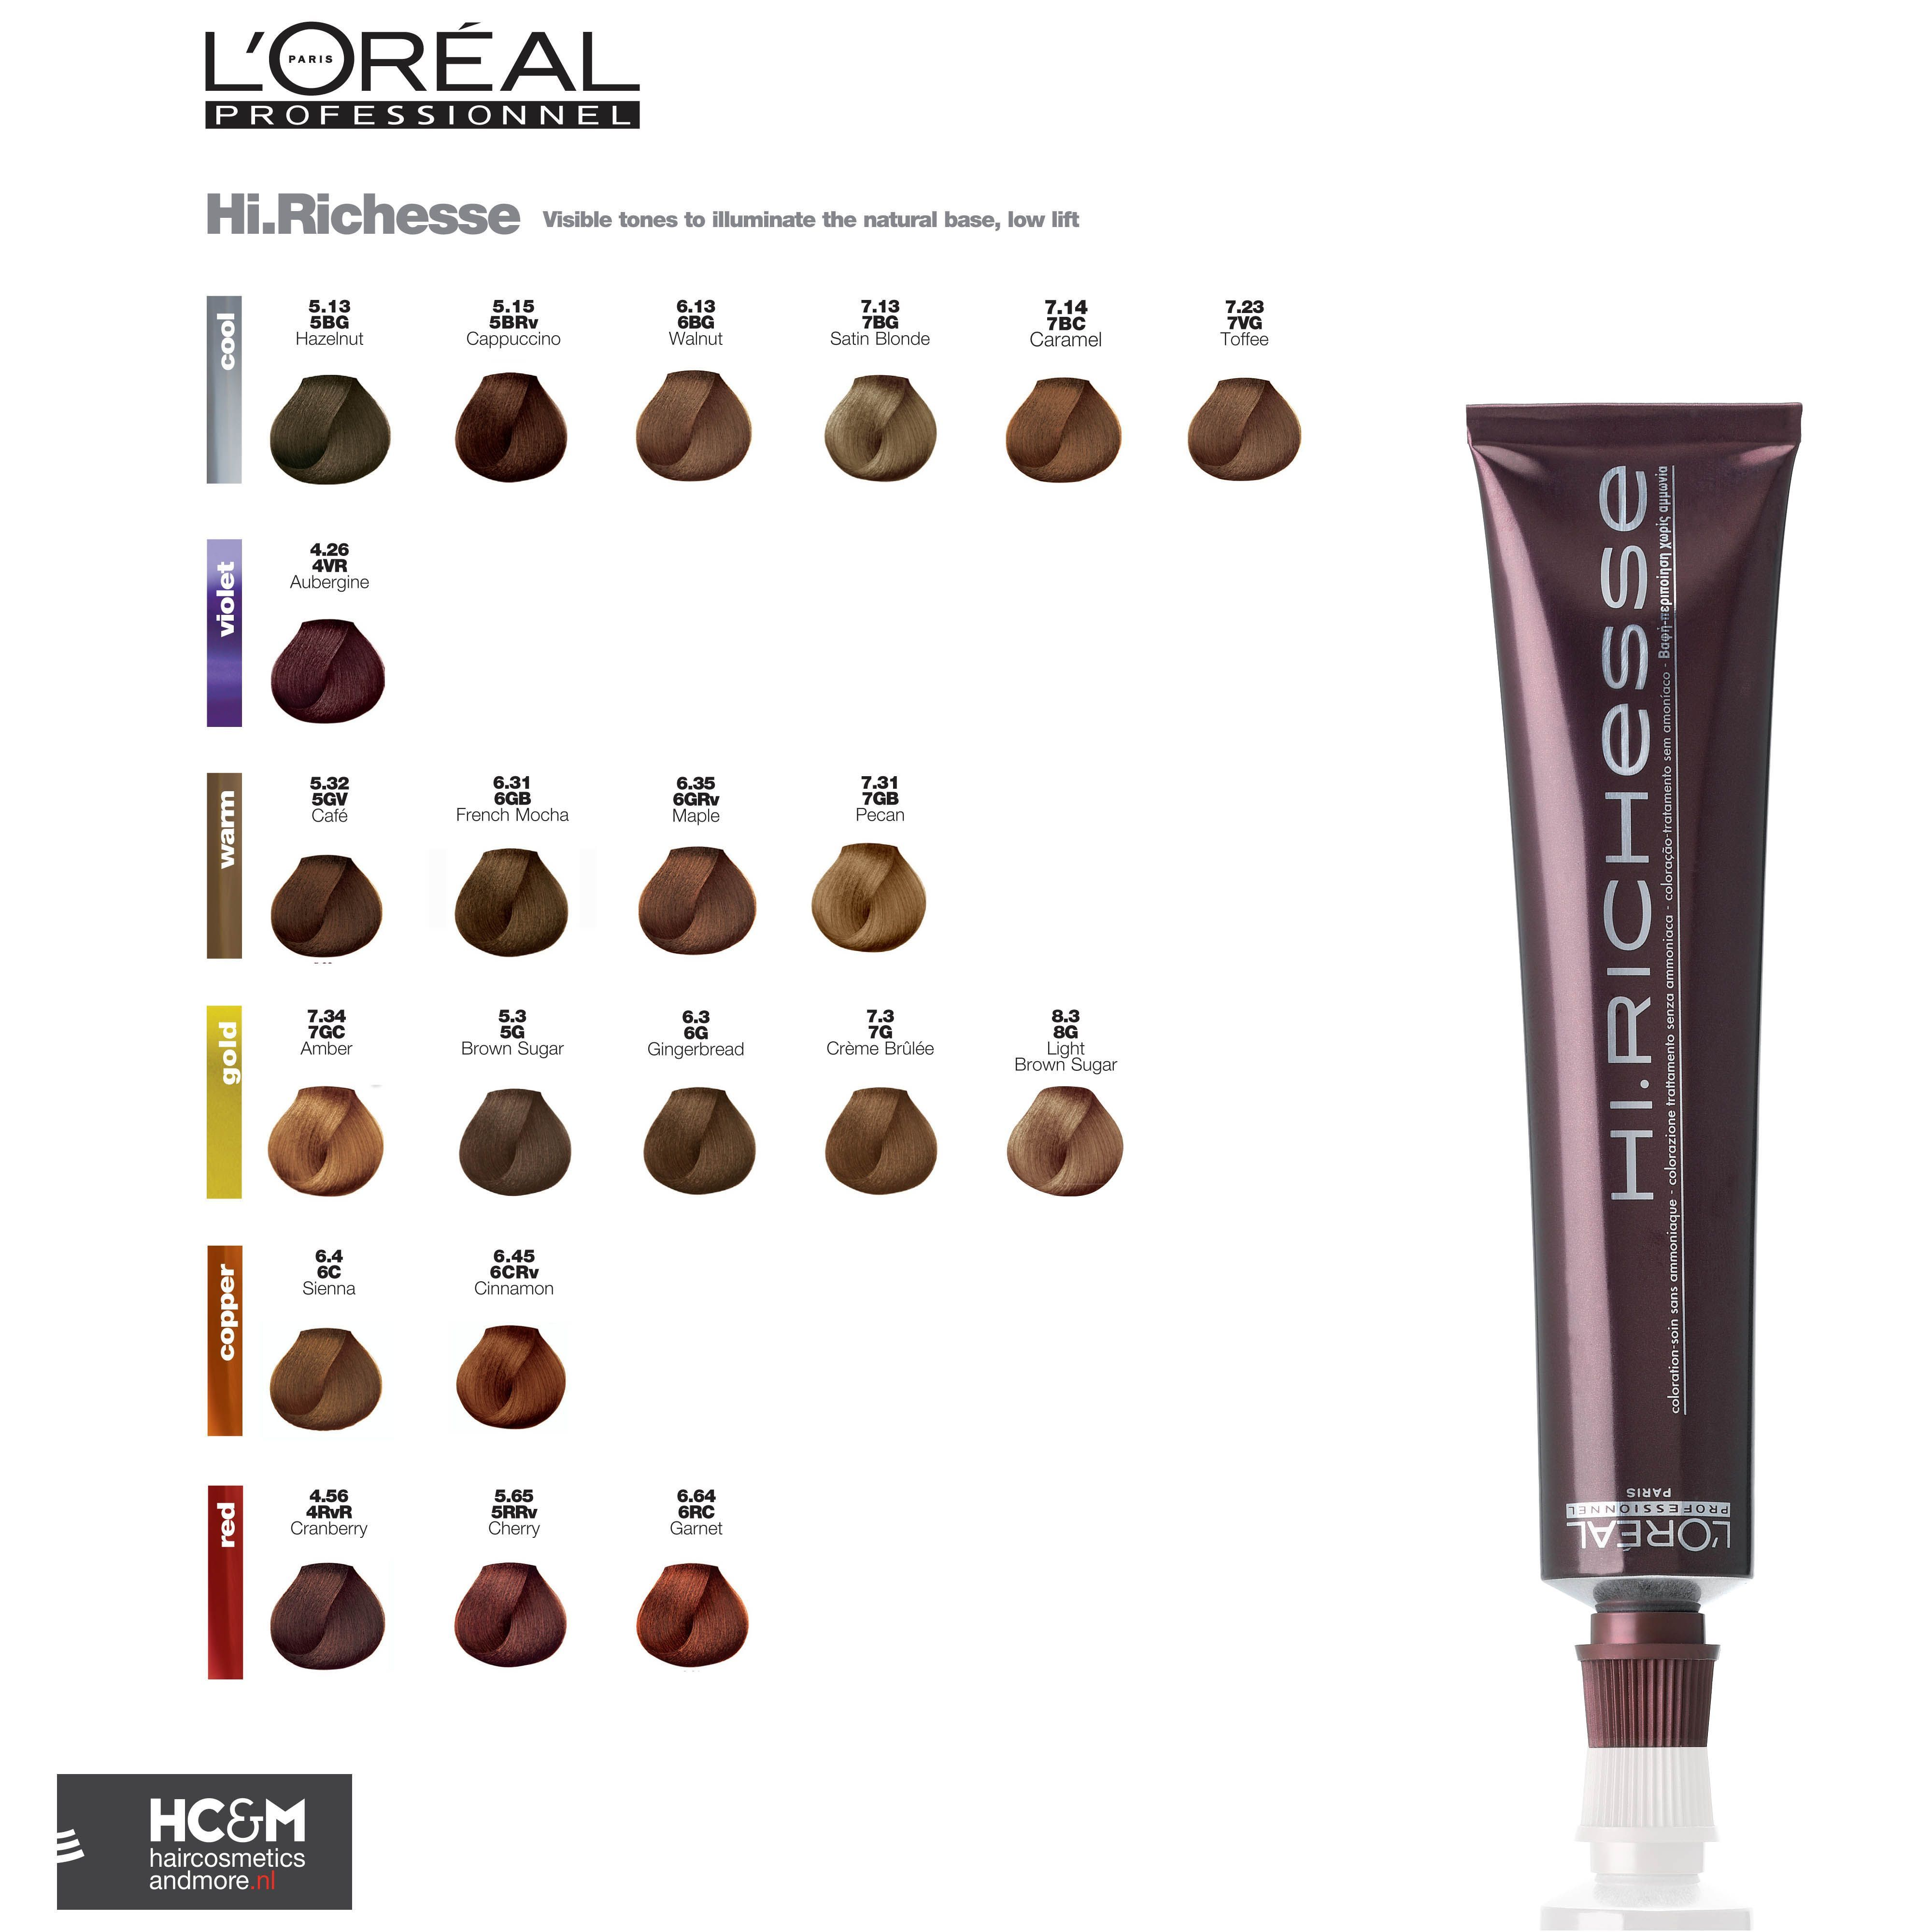 L Oreal Dia Richesse Color Chart Coloringsite